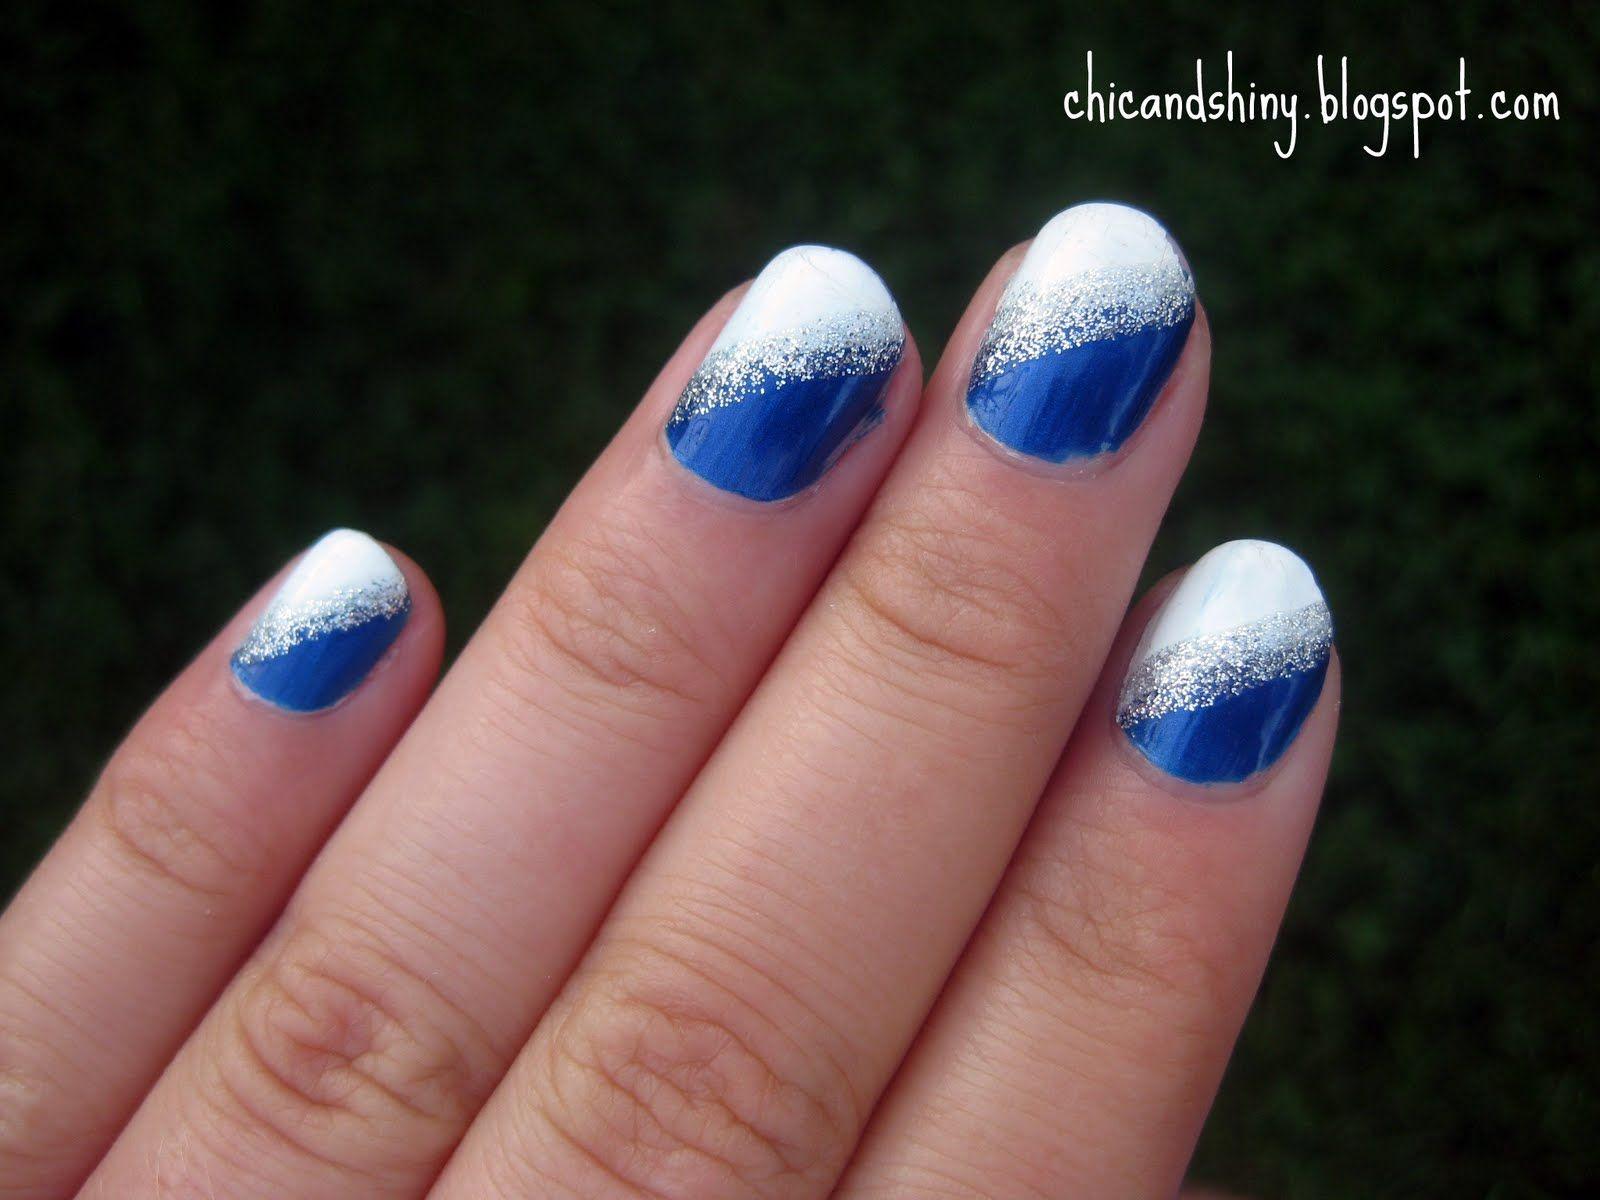 nail art blue and white nail art design nail art